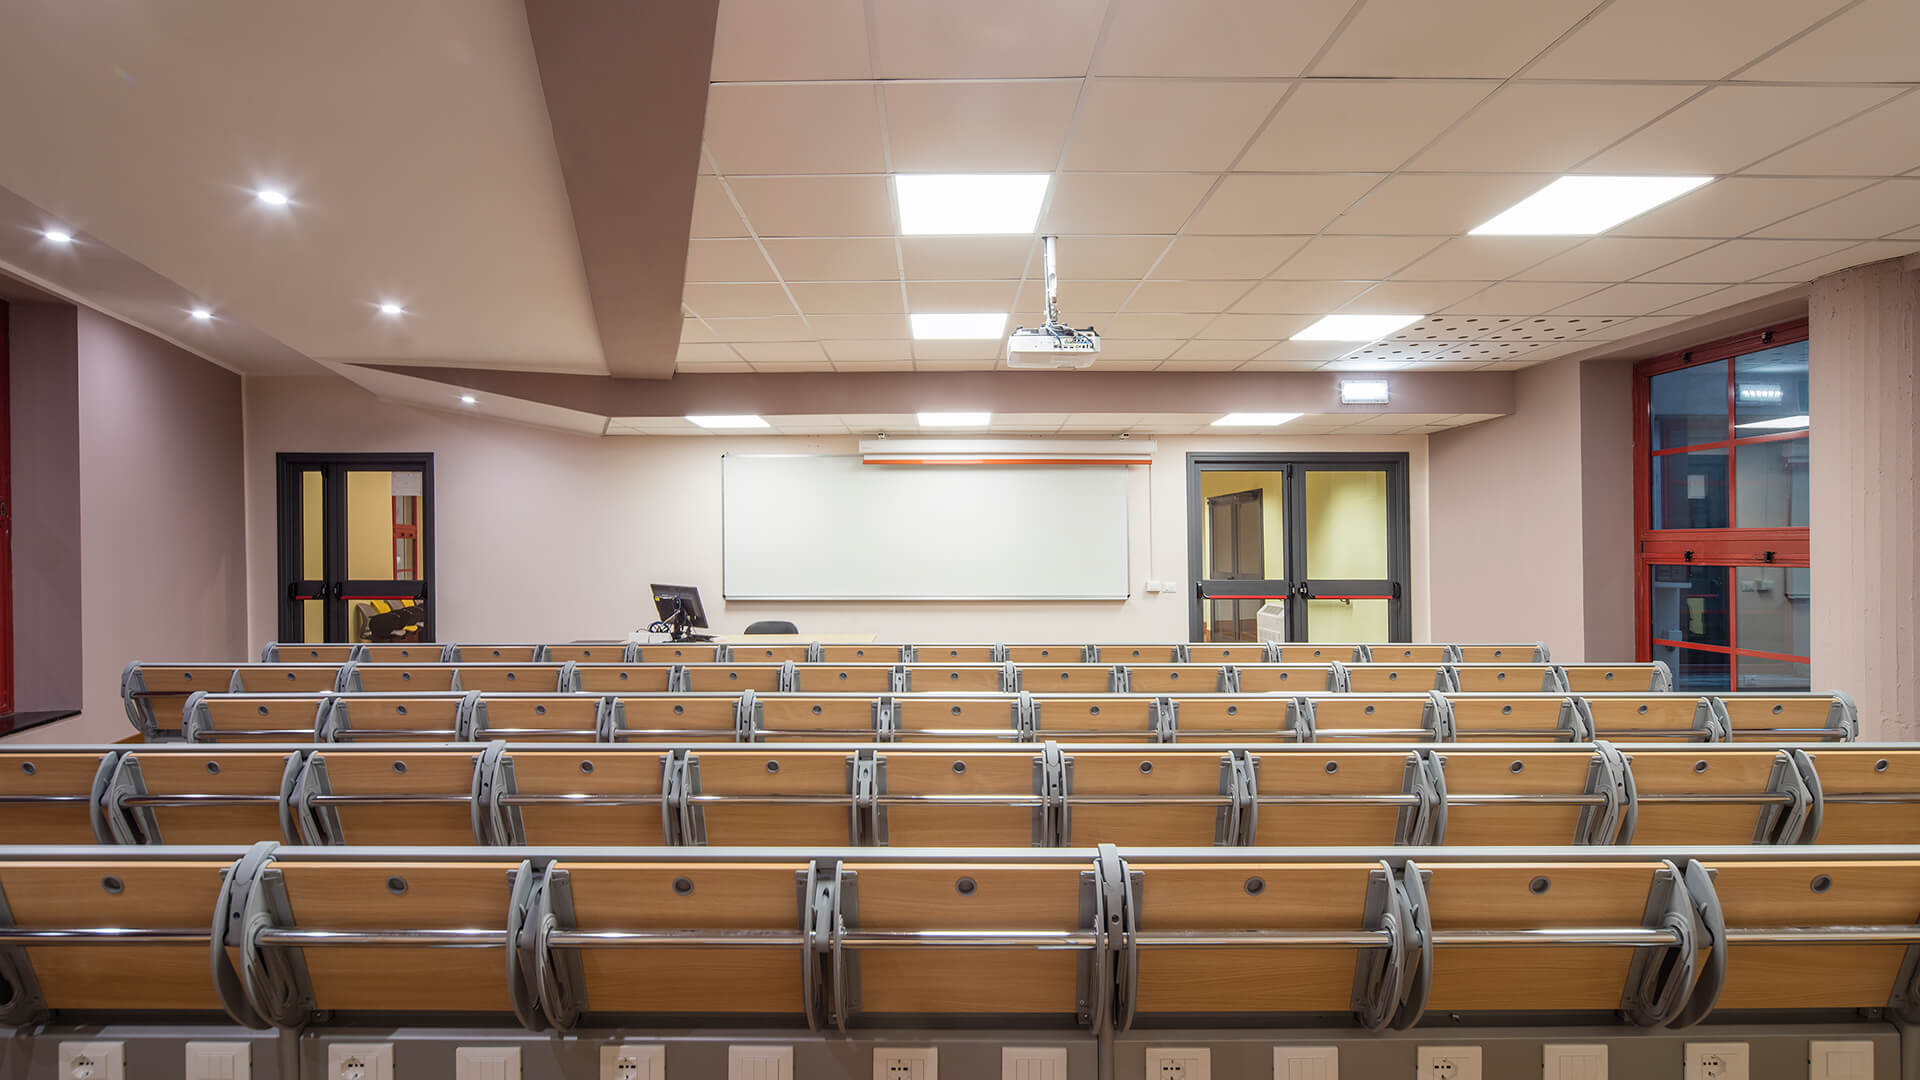 univertsita-studi-di-genova-q3000-study-bench-by-lamm-7